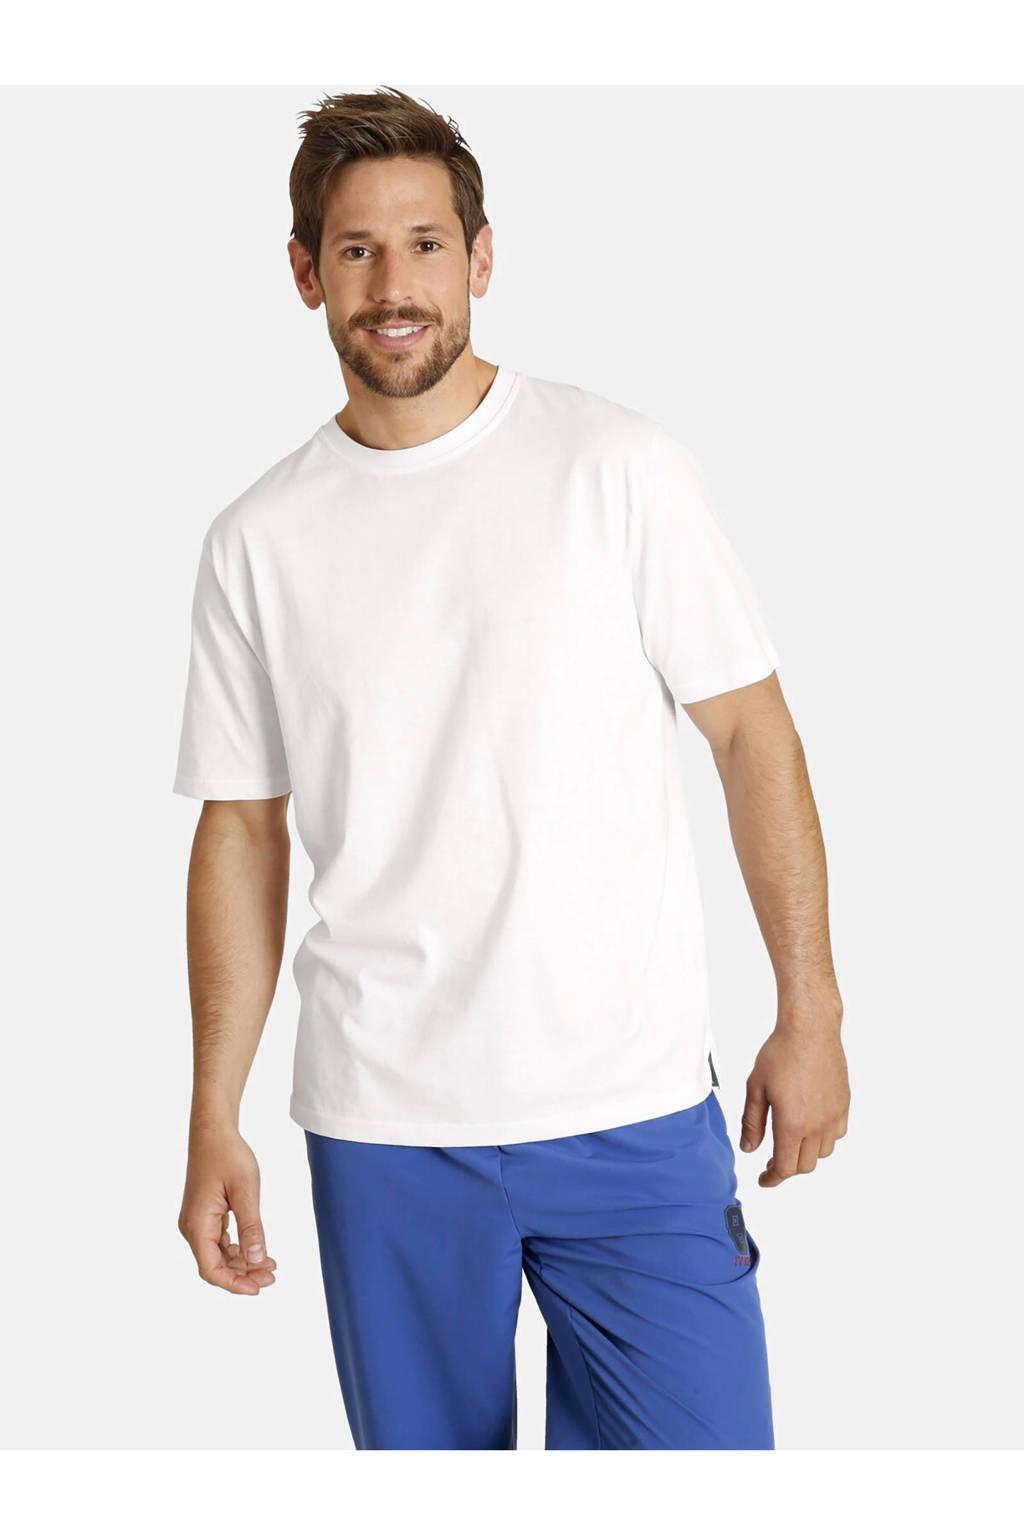 Jan Vanderstorm T-shirt Plus Size Erke - (set van 2), Wit